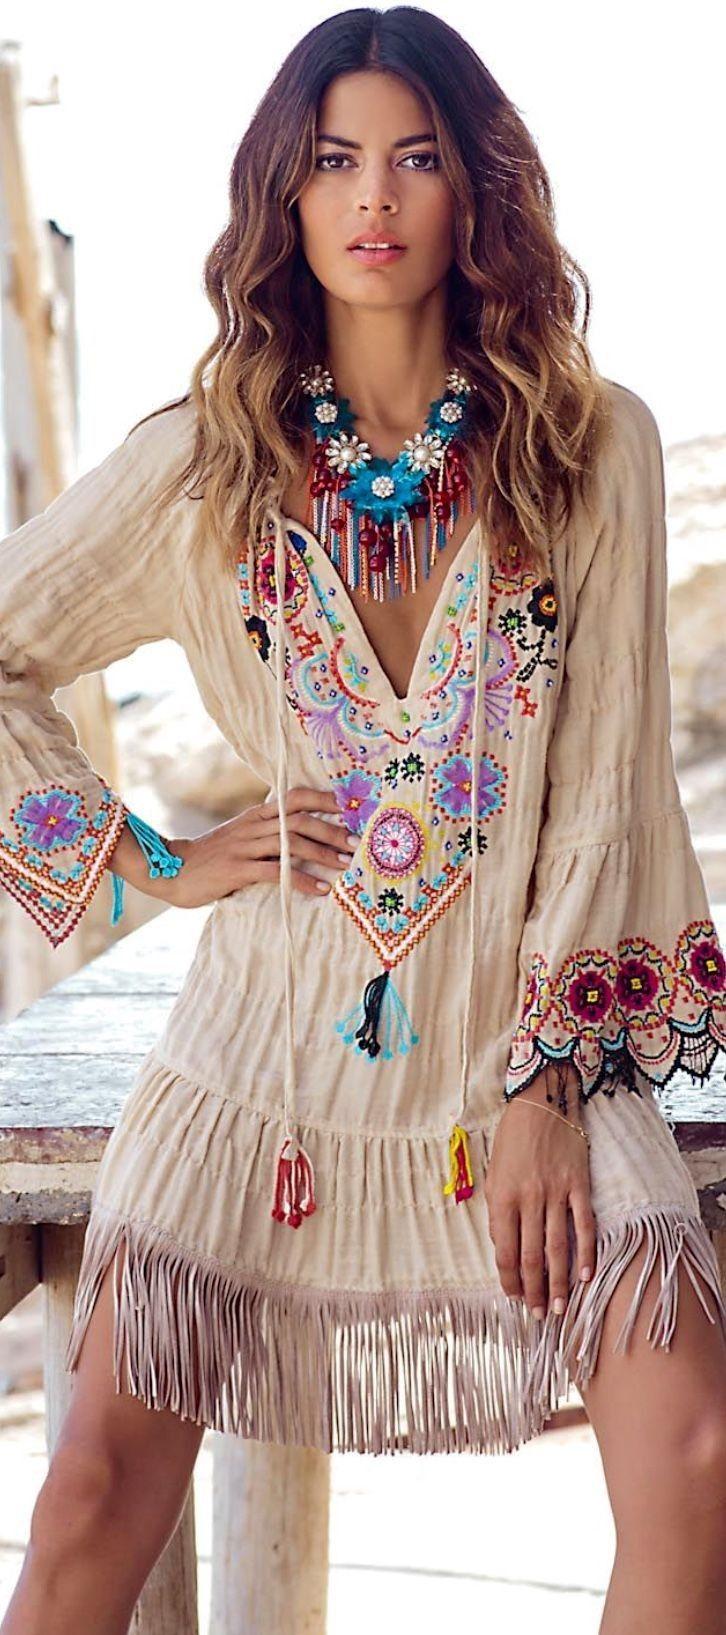 Best 25 Bohemian Decor Ideas On Pinterest: 25+ Best Ideas About Bohemian Style Dresses On Pinterest